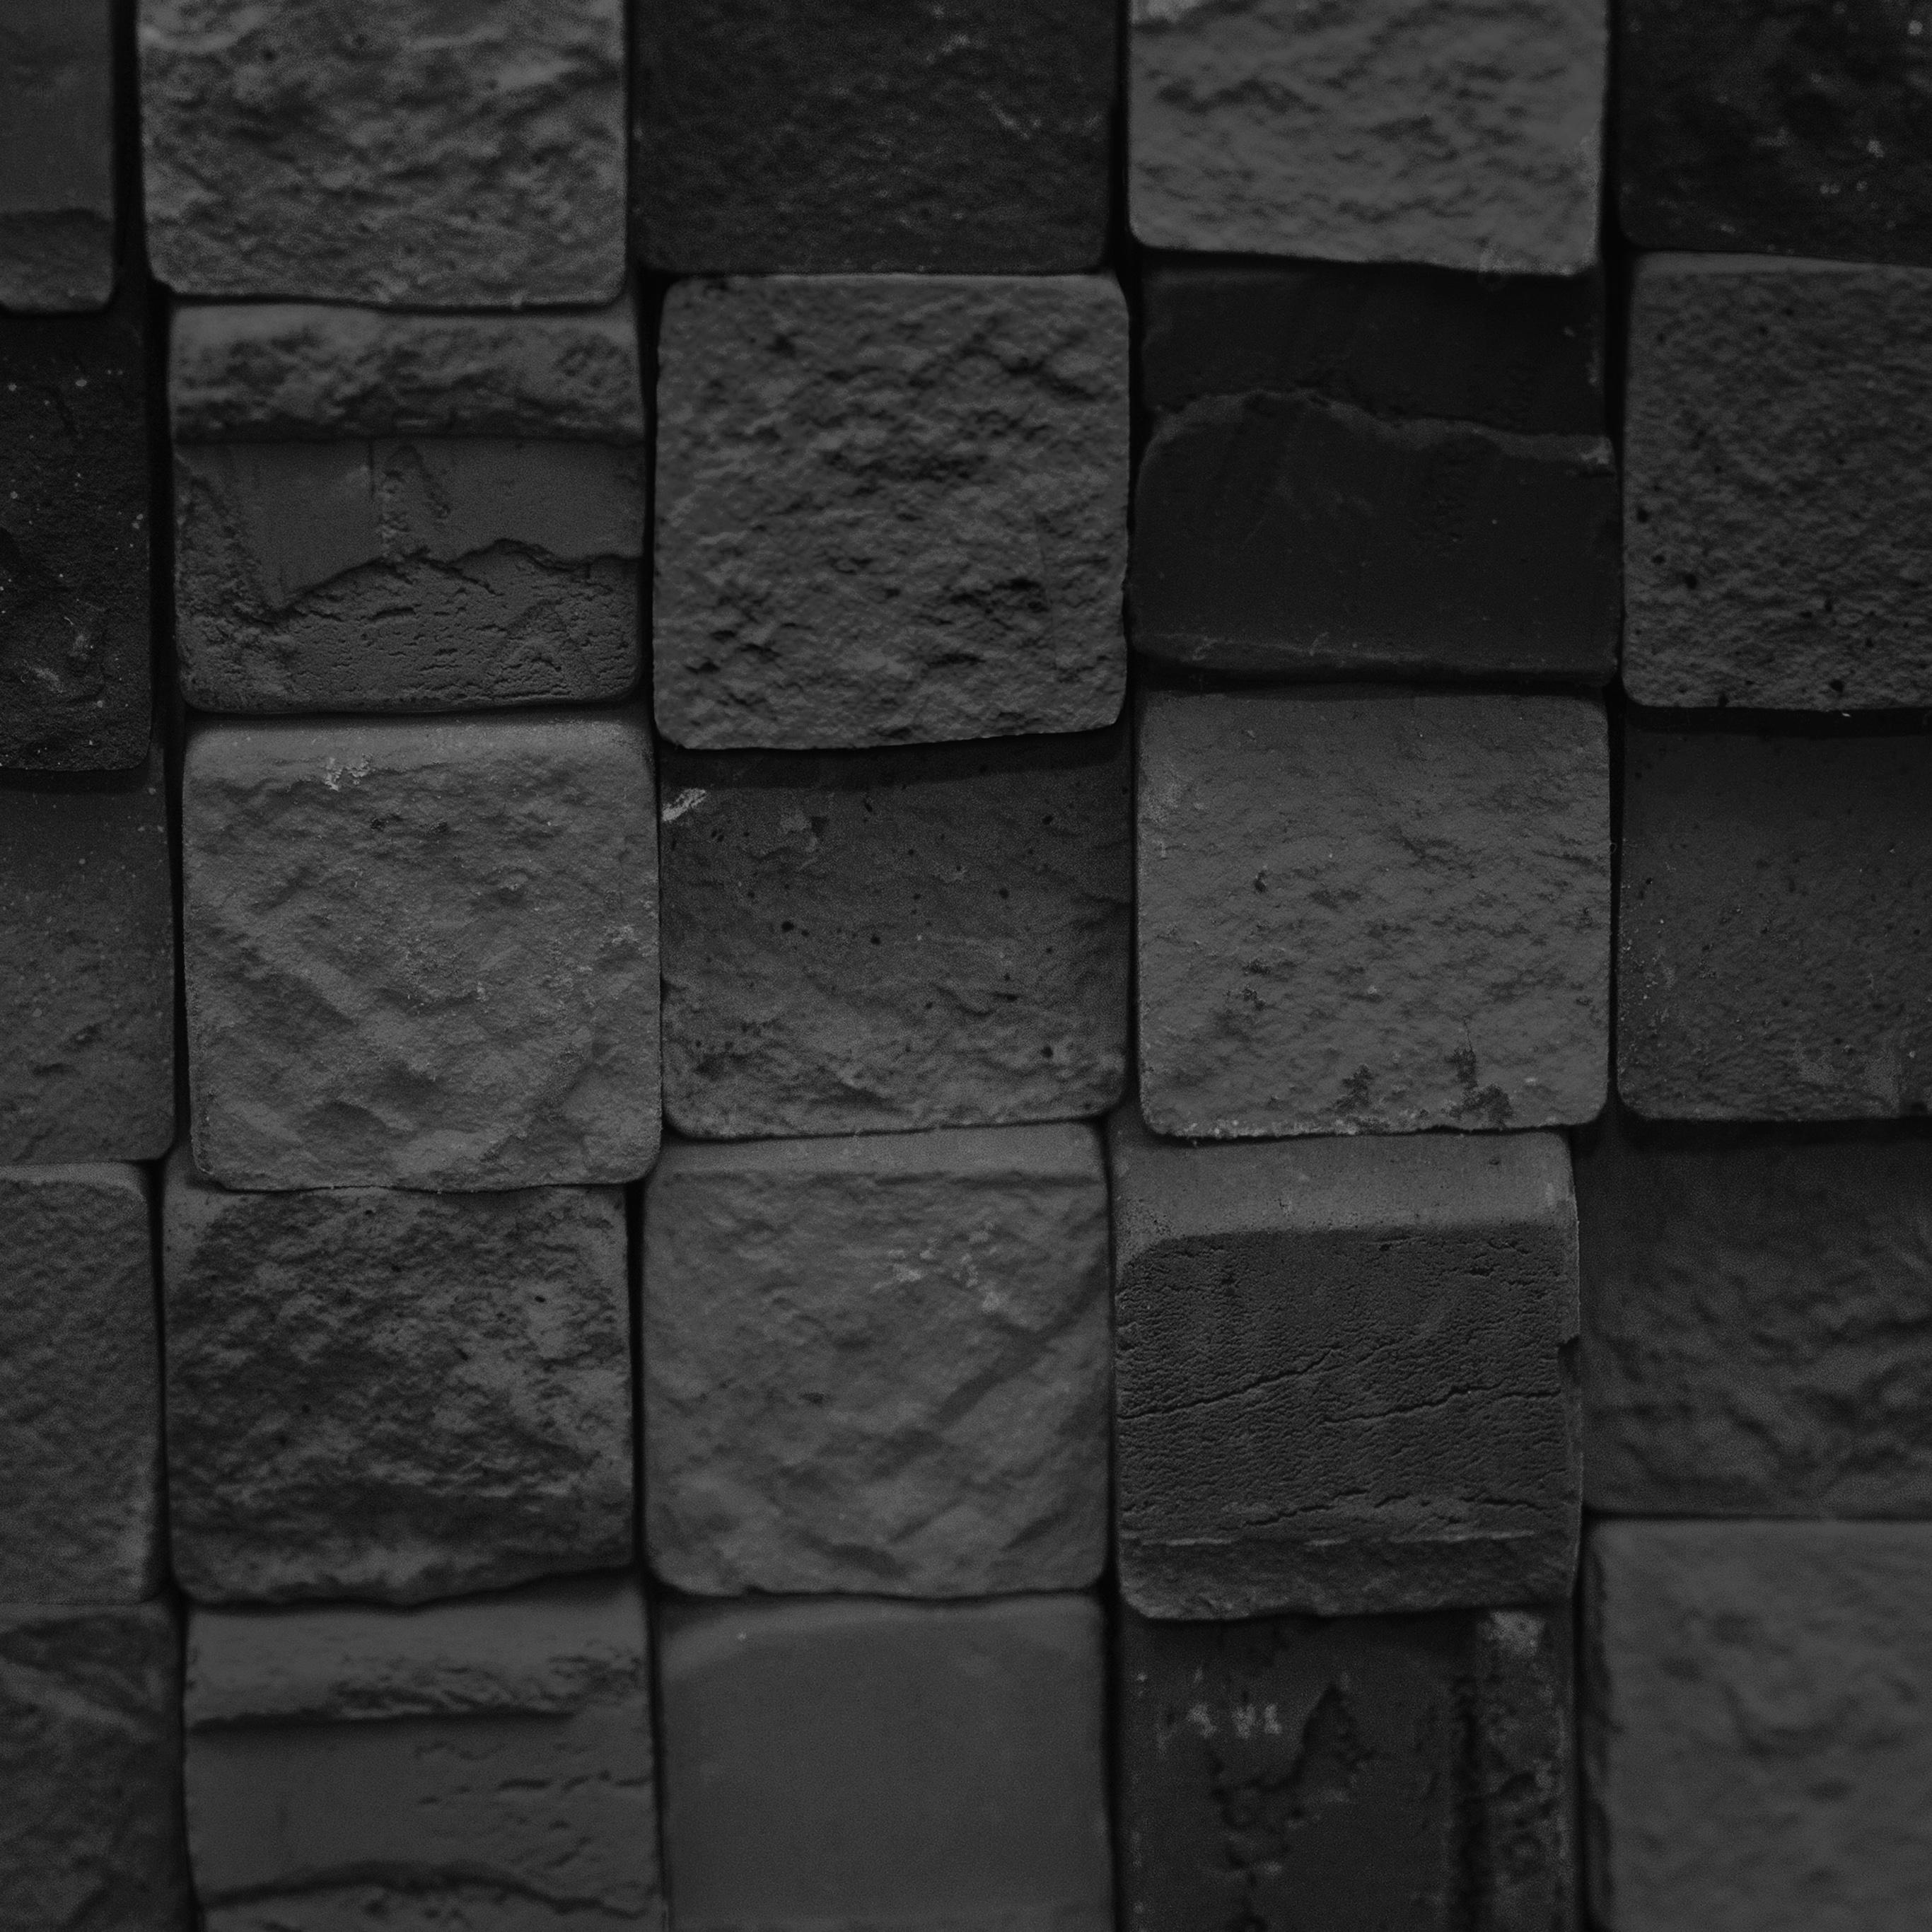 Vh70-color-block-art-black-pattern-wallpaper